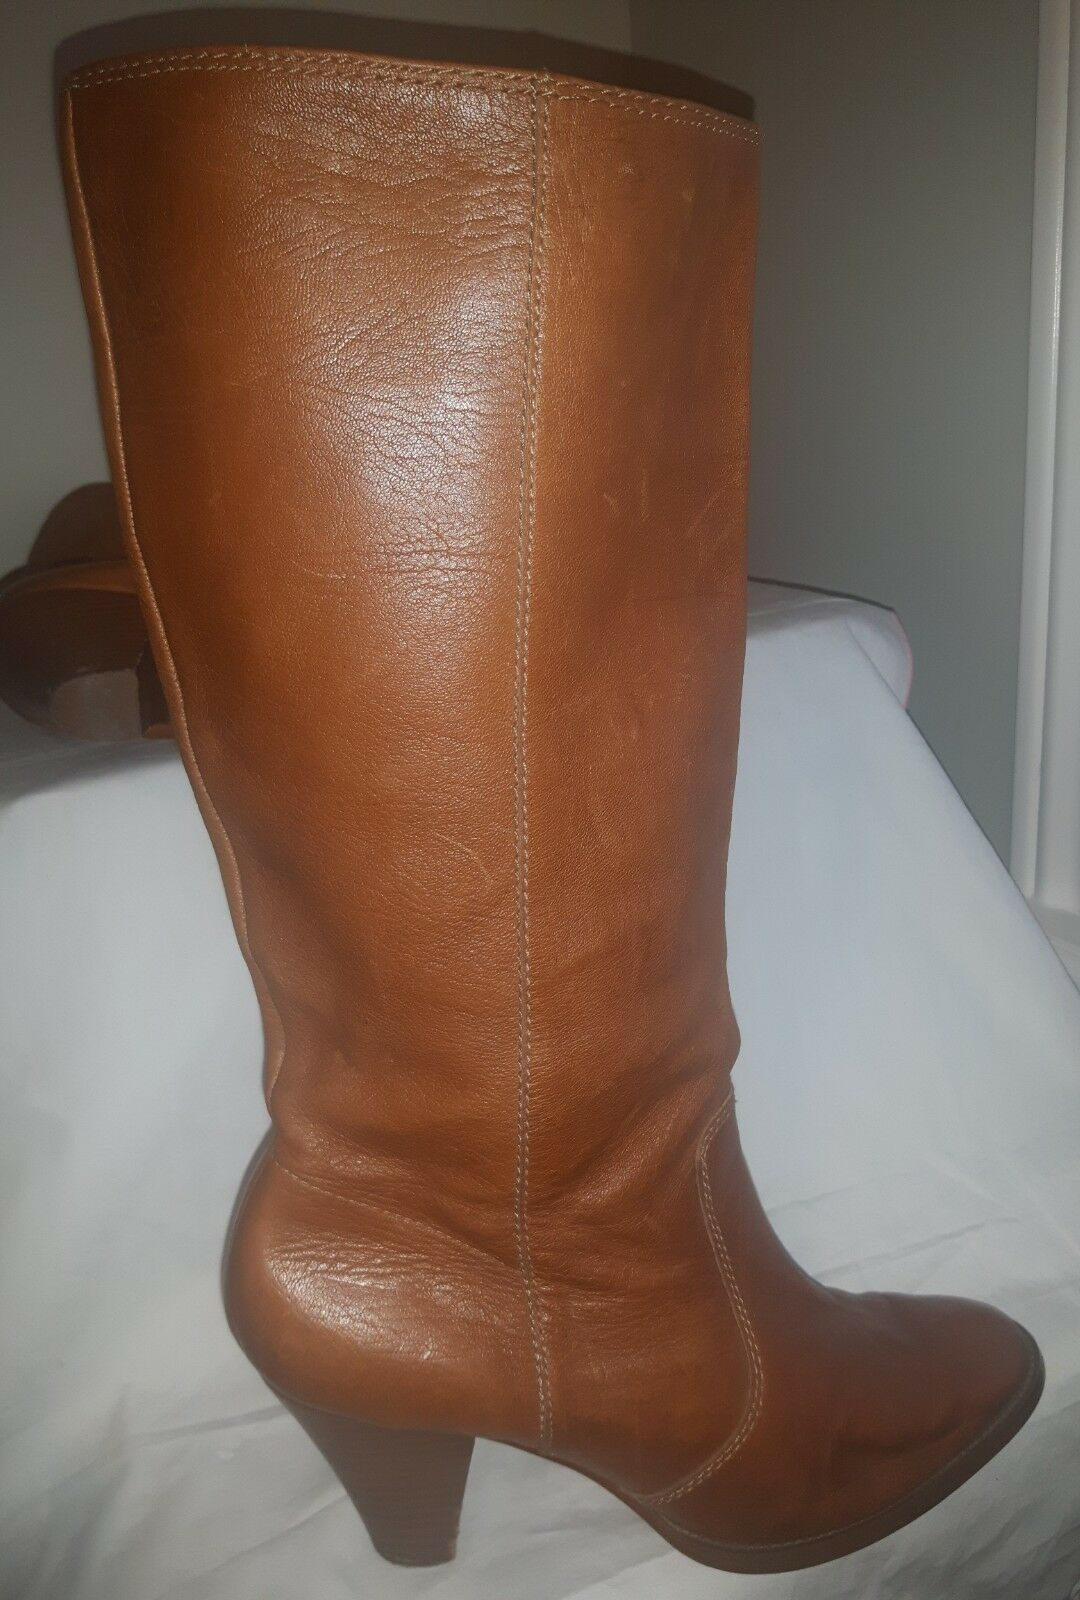 RETRO ALFANI PORTER tall leather Stiefel soft carmel leather ladies Größe 9.5